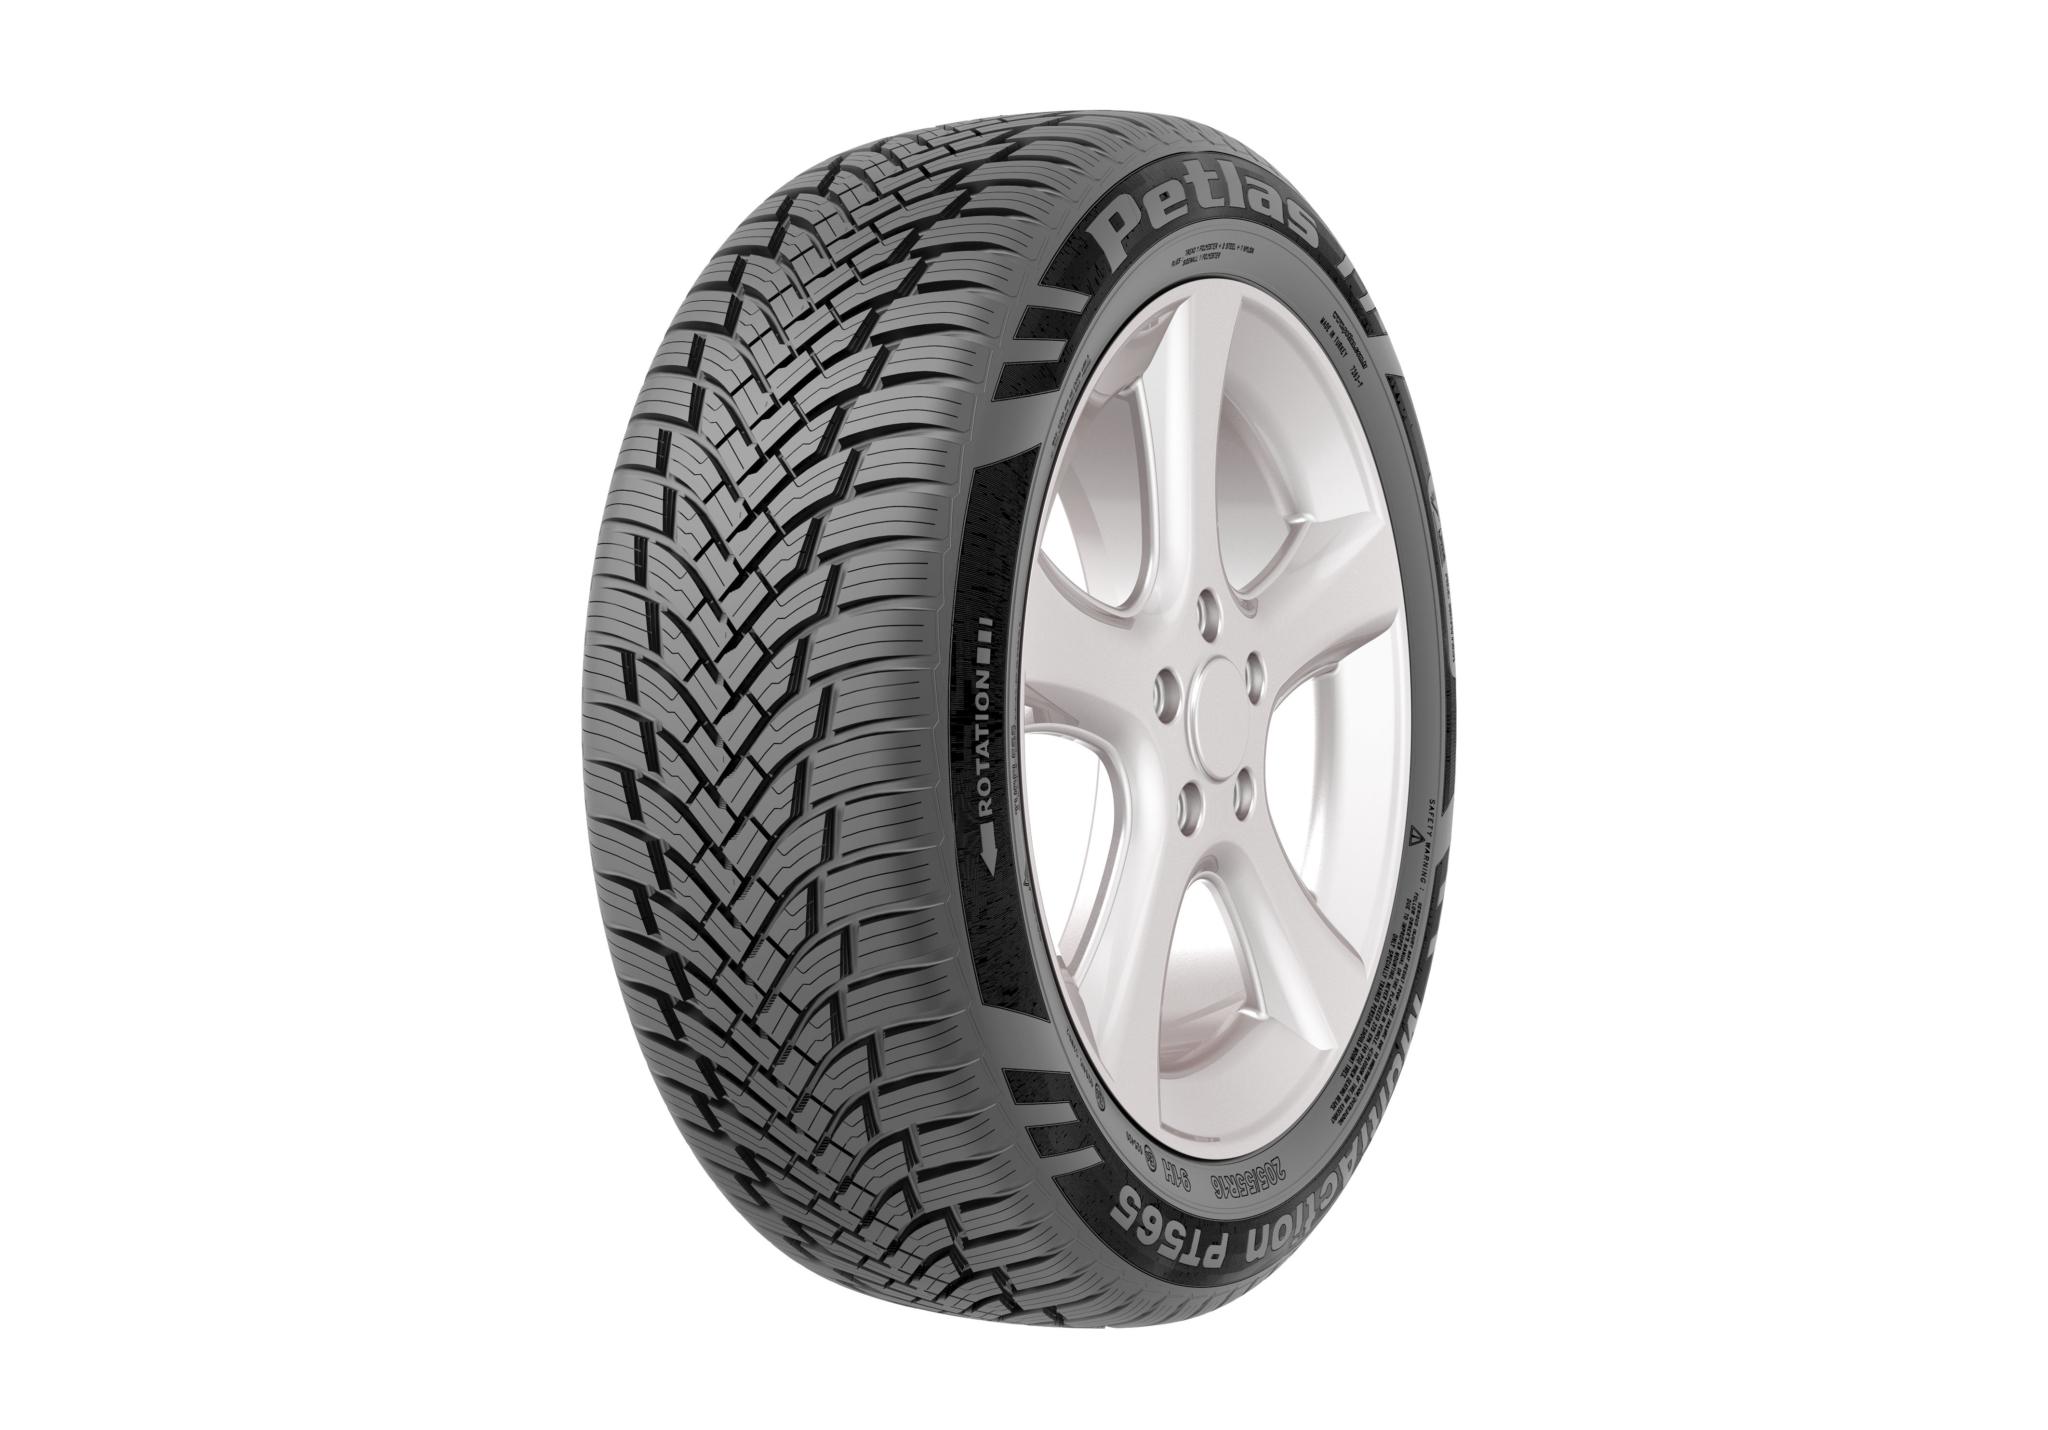 Petlas launches 1st all-season car tyre, following SUV 3PMSF certification